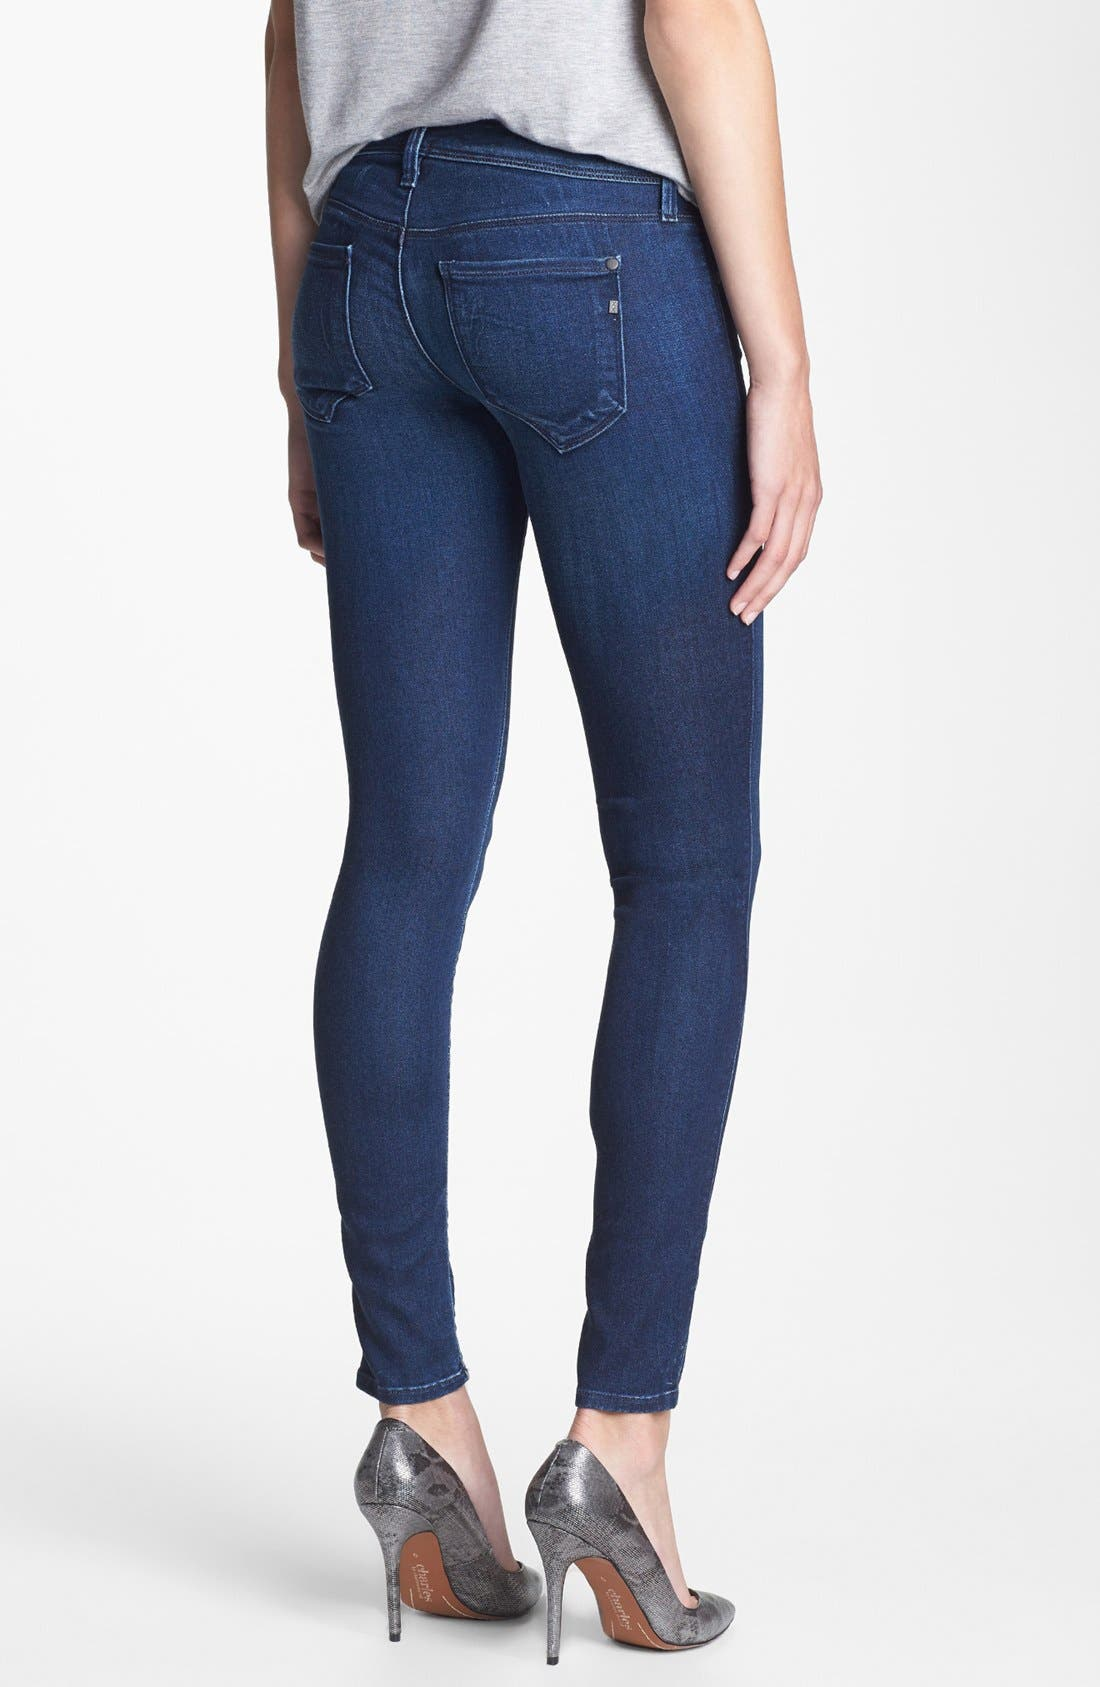 Alternate Image 2  - Genetic 'The Shya' Soft Cigarette Jeans (Vista)